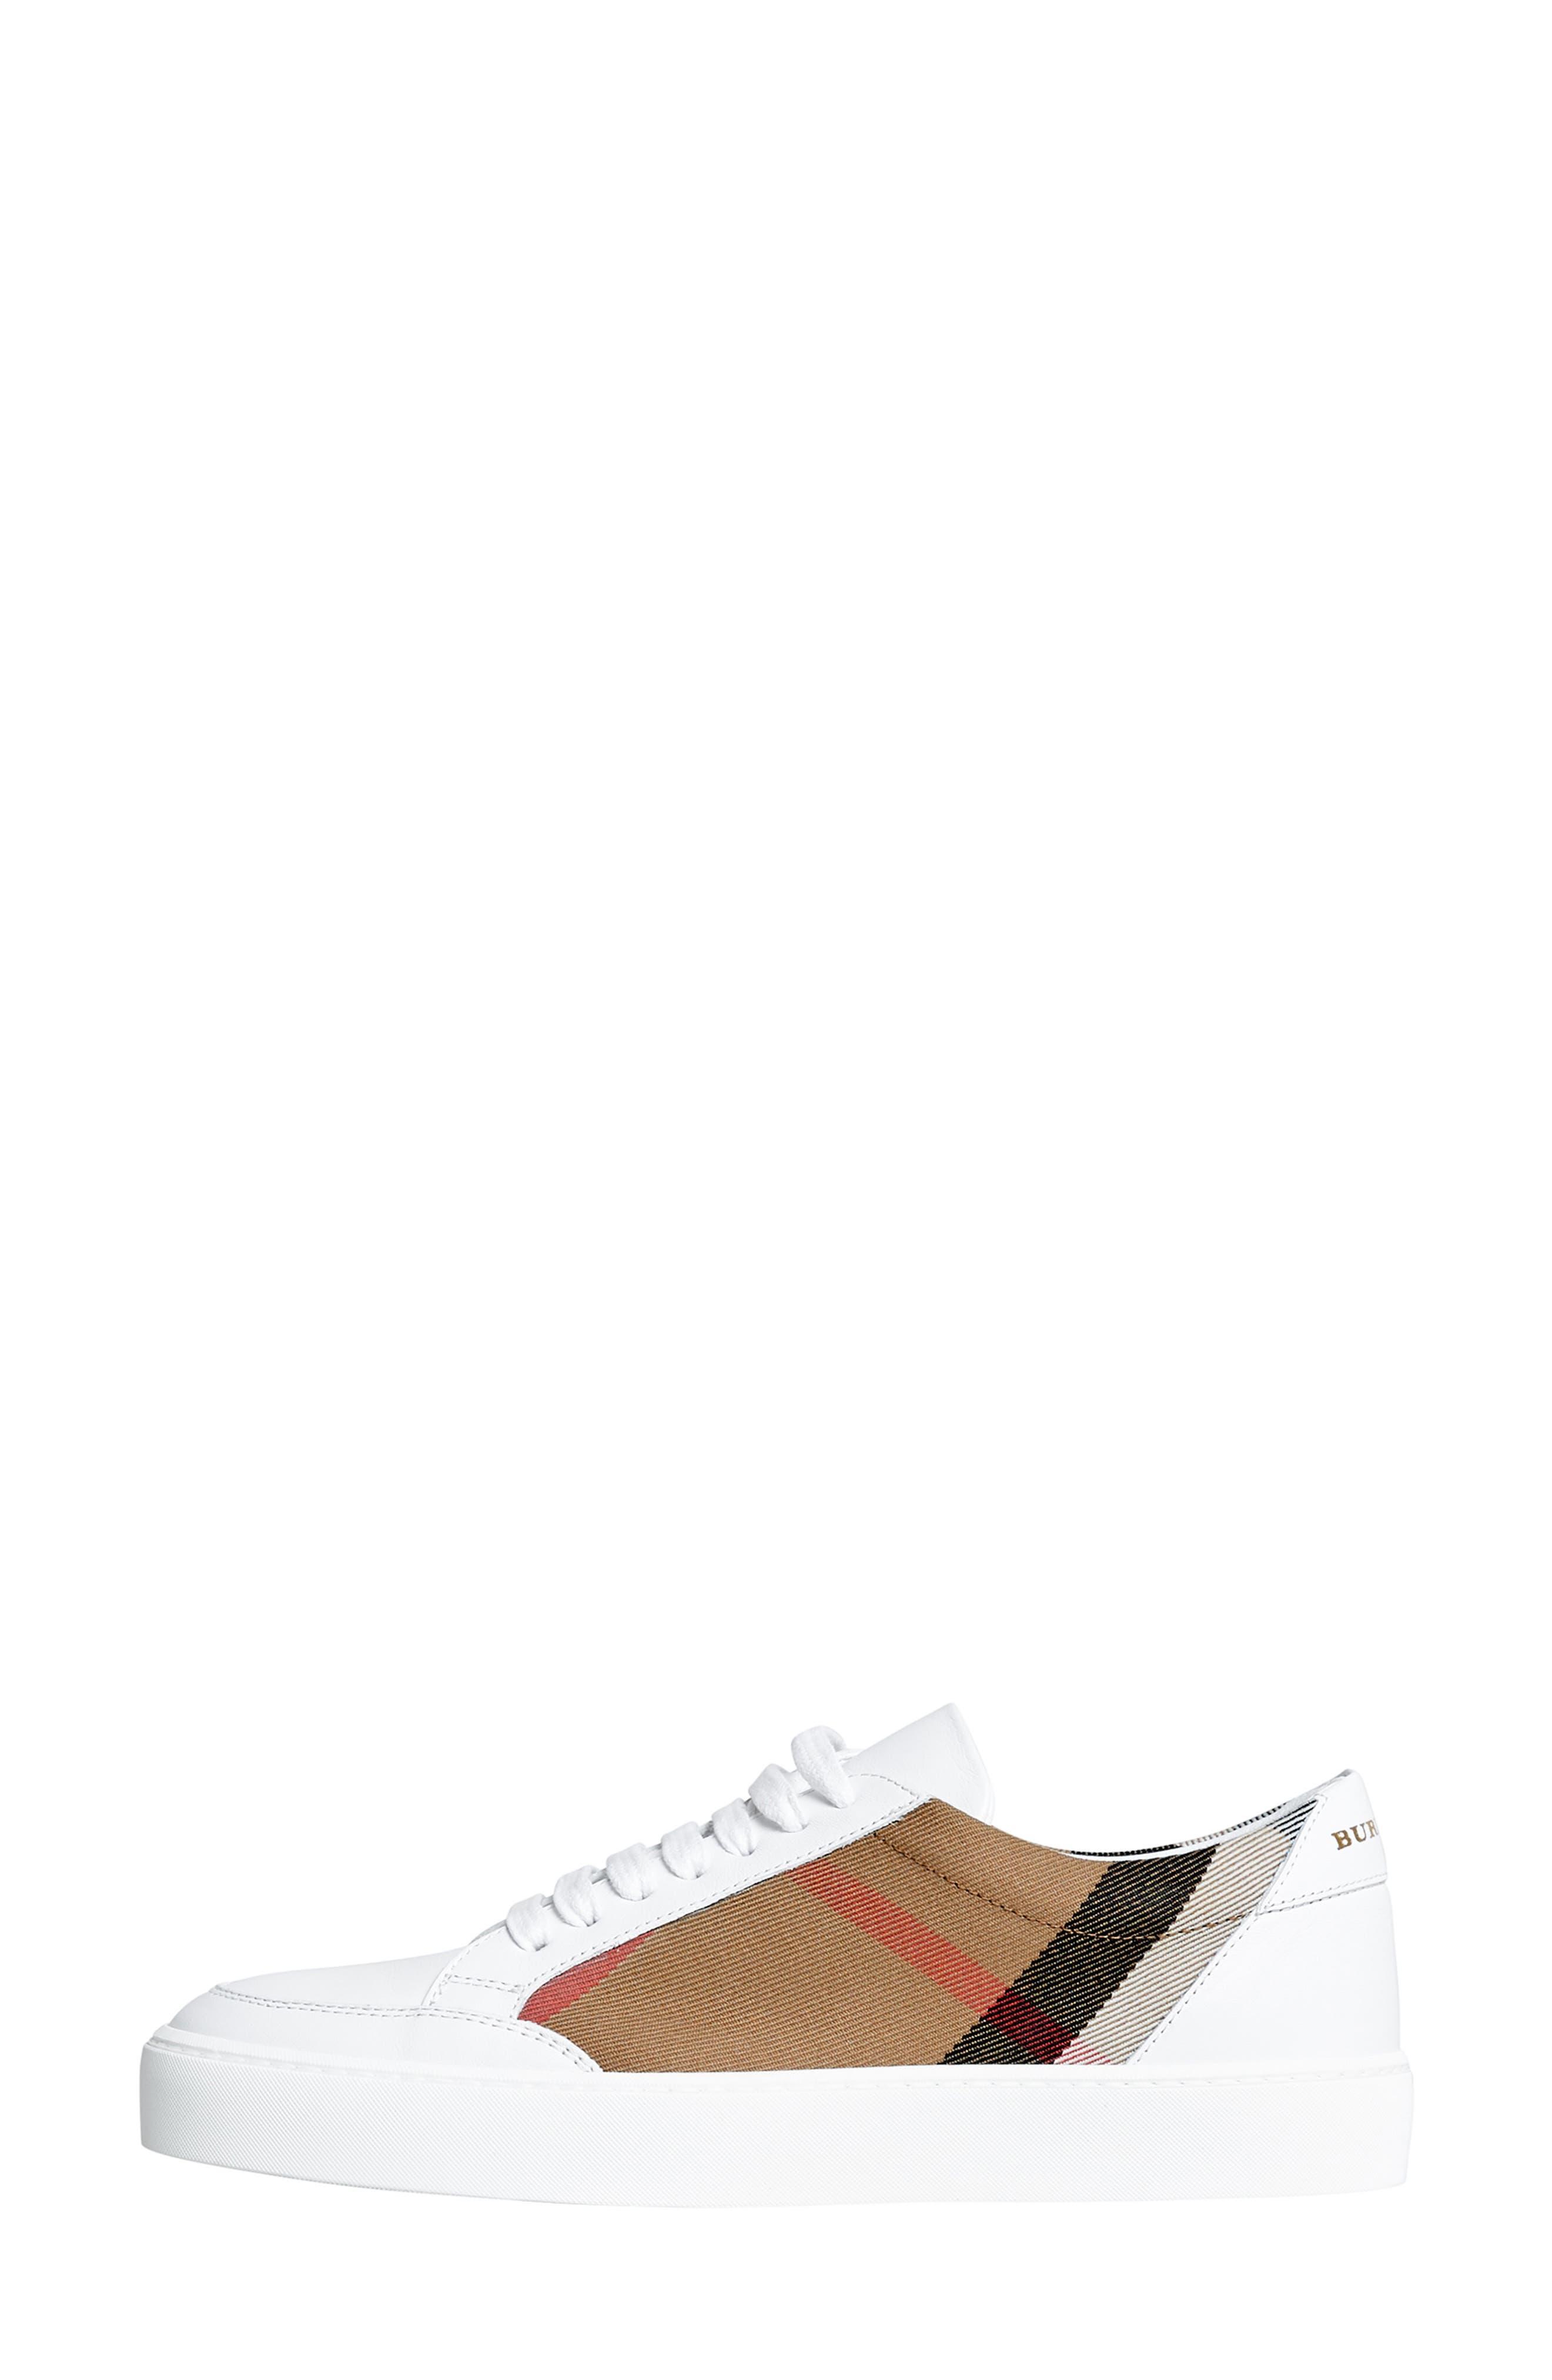 BURBERRY, Salmond Sneaker, Alternate thumbnail 10, color, WHITE